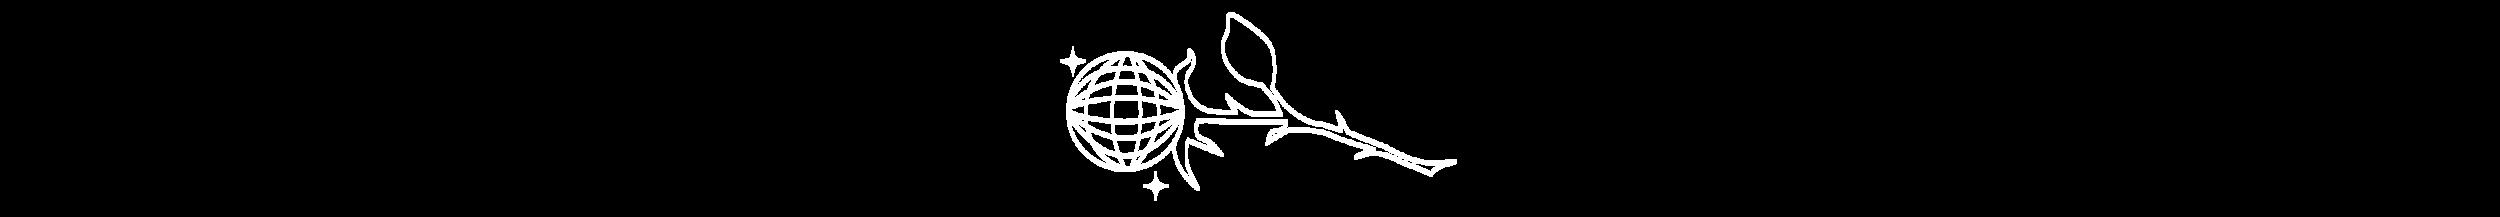 rose long.png